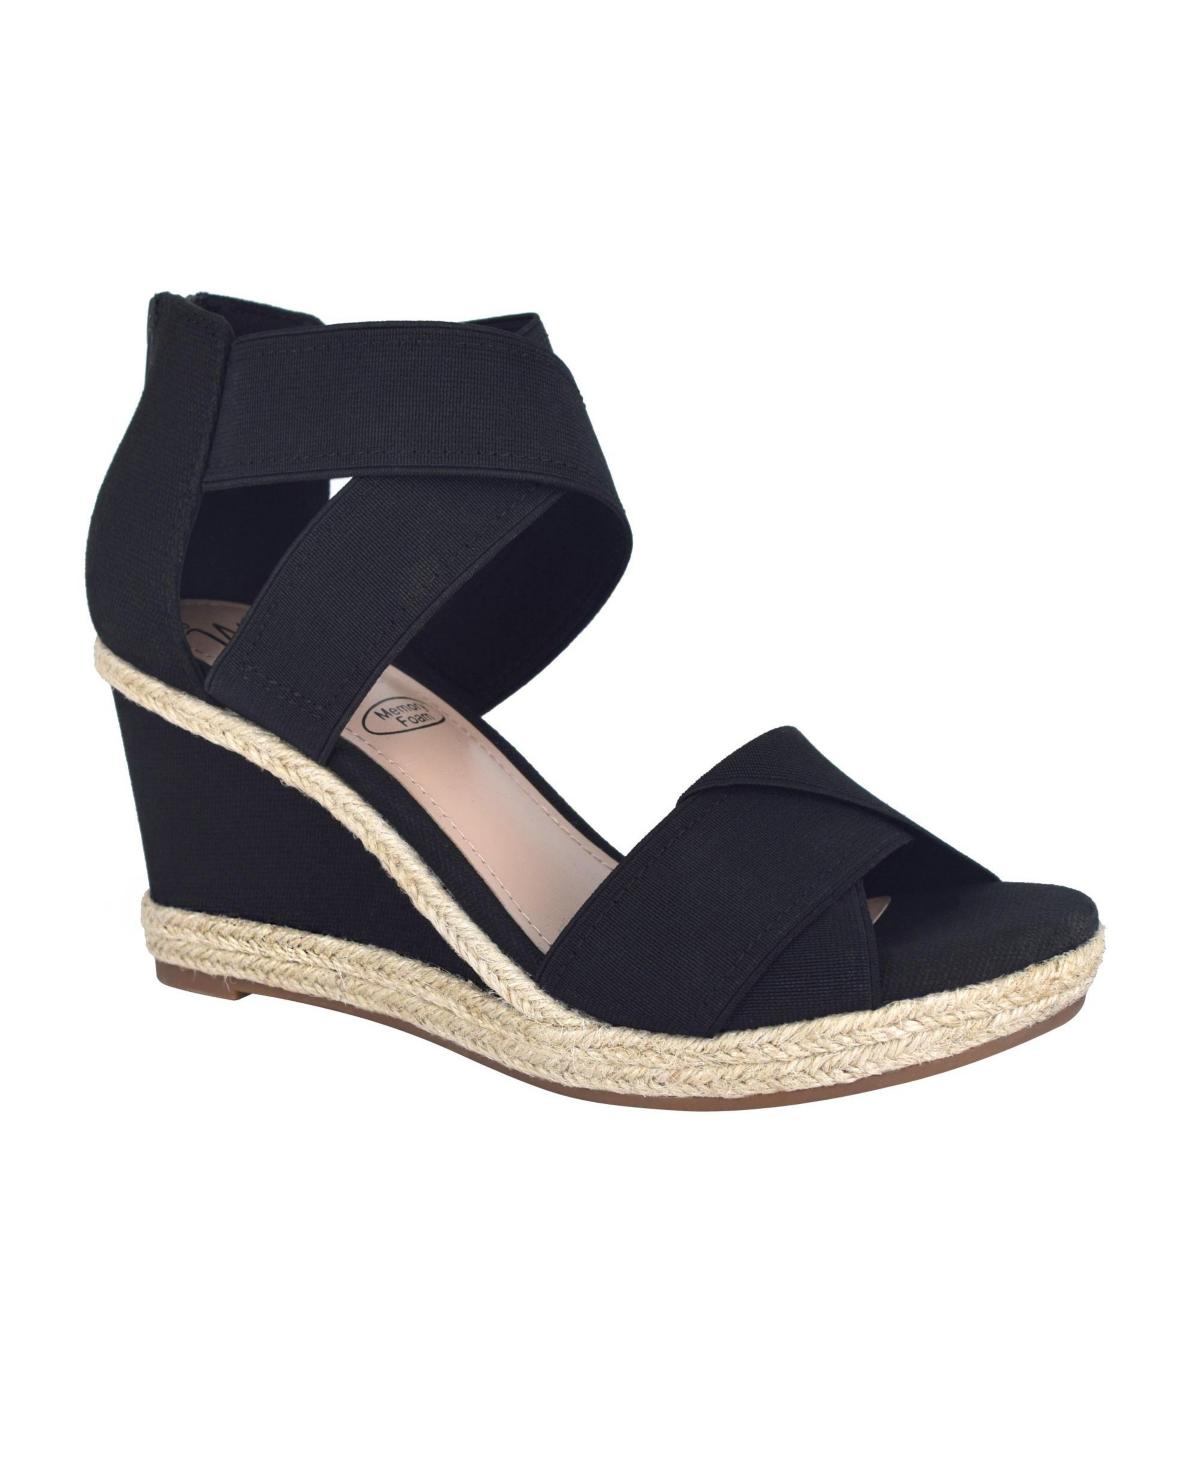 Impo Trissa Espadrille Wedge Sandal Women's Shoes